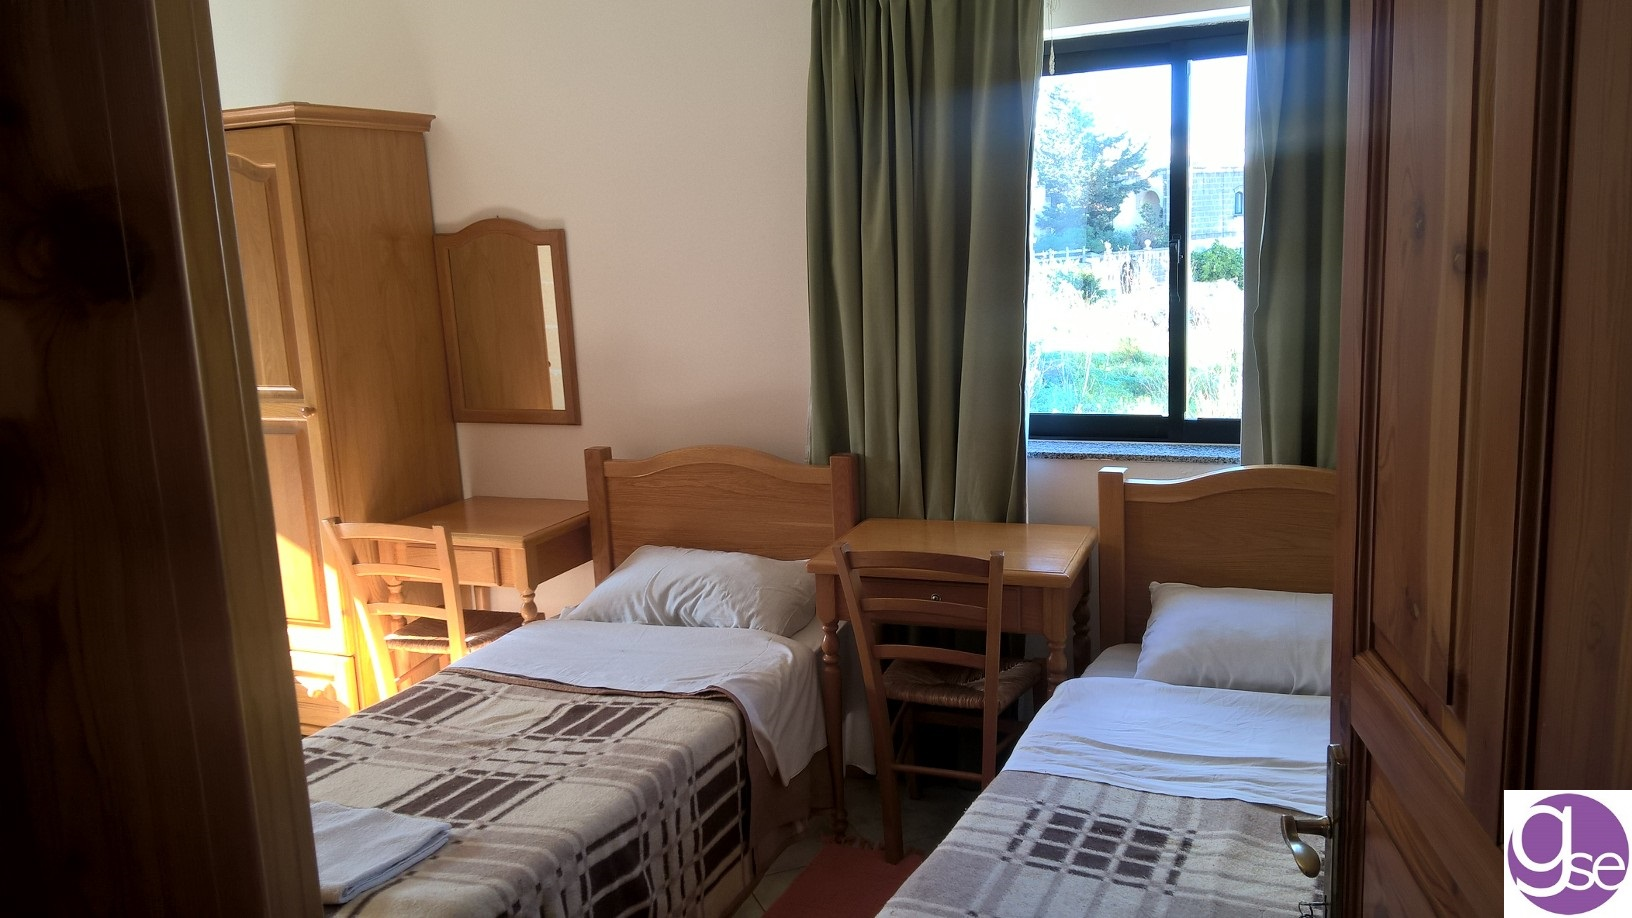 GSE Malta dil okulu yurt konaklamasi iki kisilik odalar